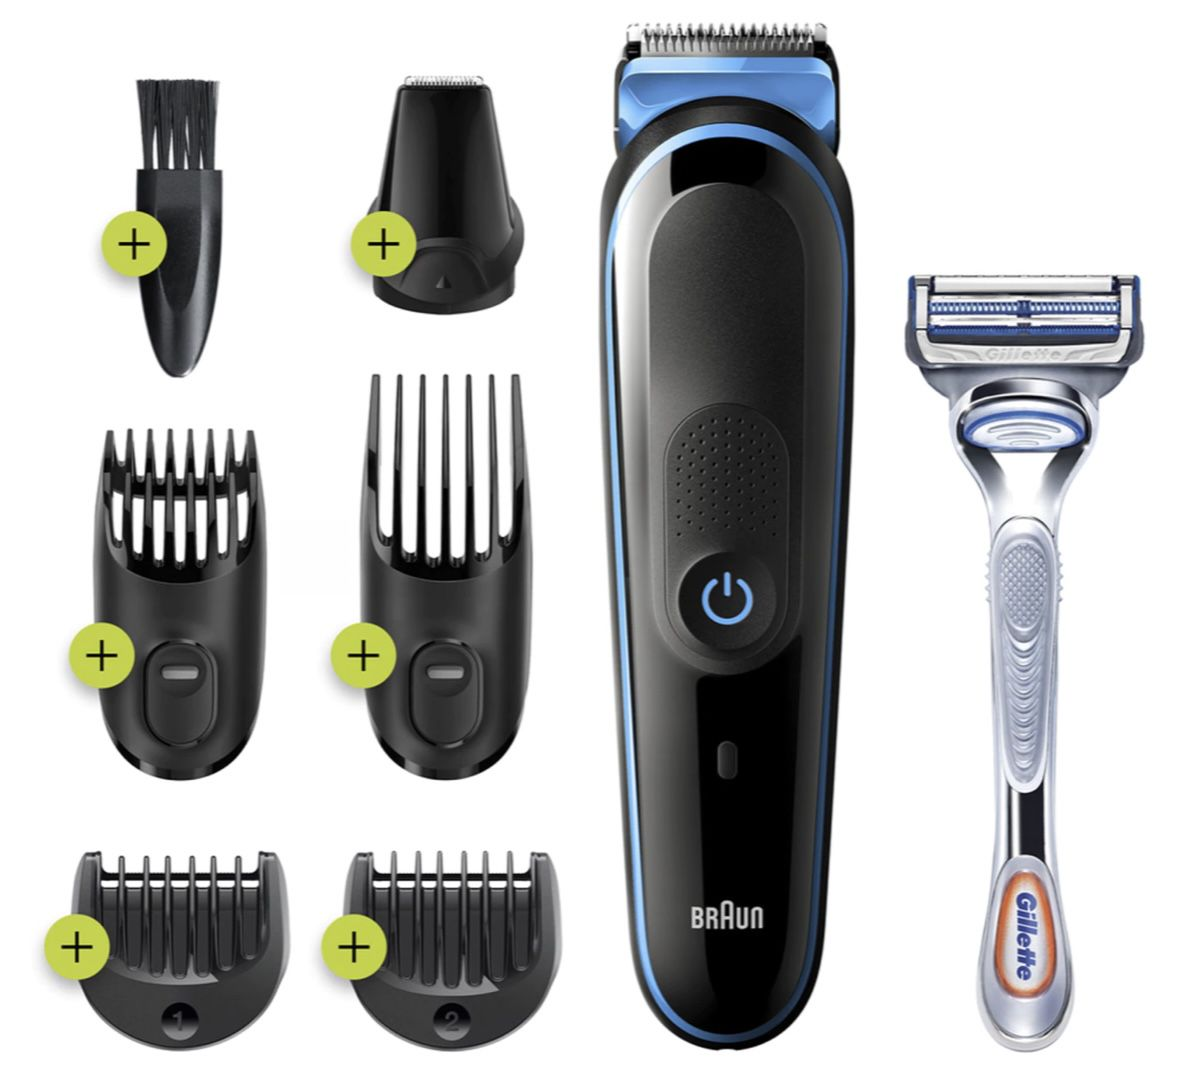 Braun 3242 Multi Grooming Kit 7 in 1 für 25,11€ (statt 29€)